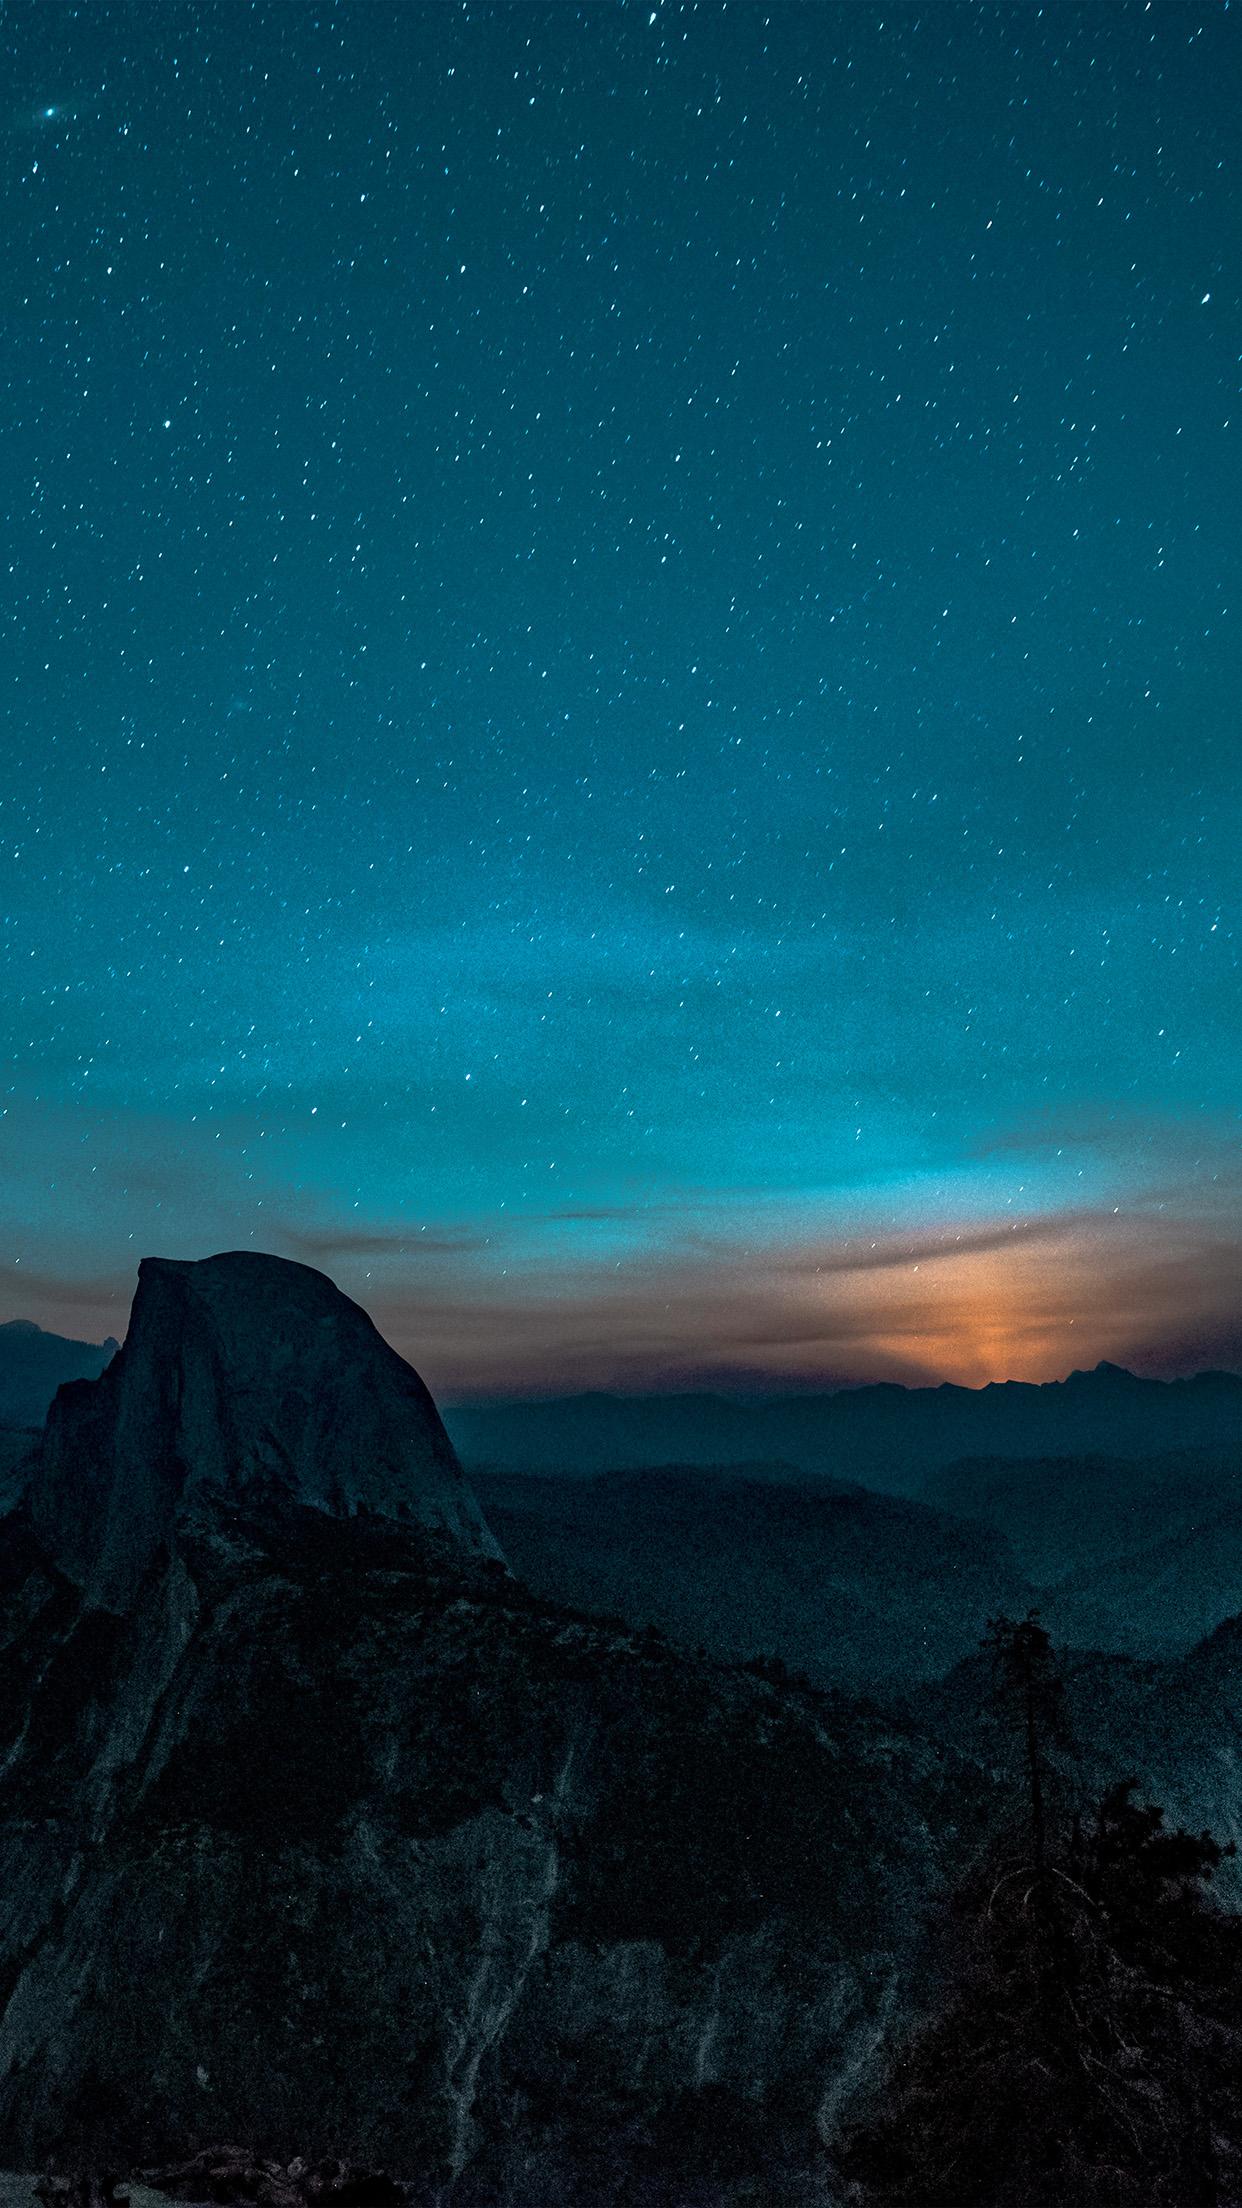 ns52-mountain-night-sk...